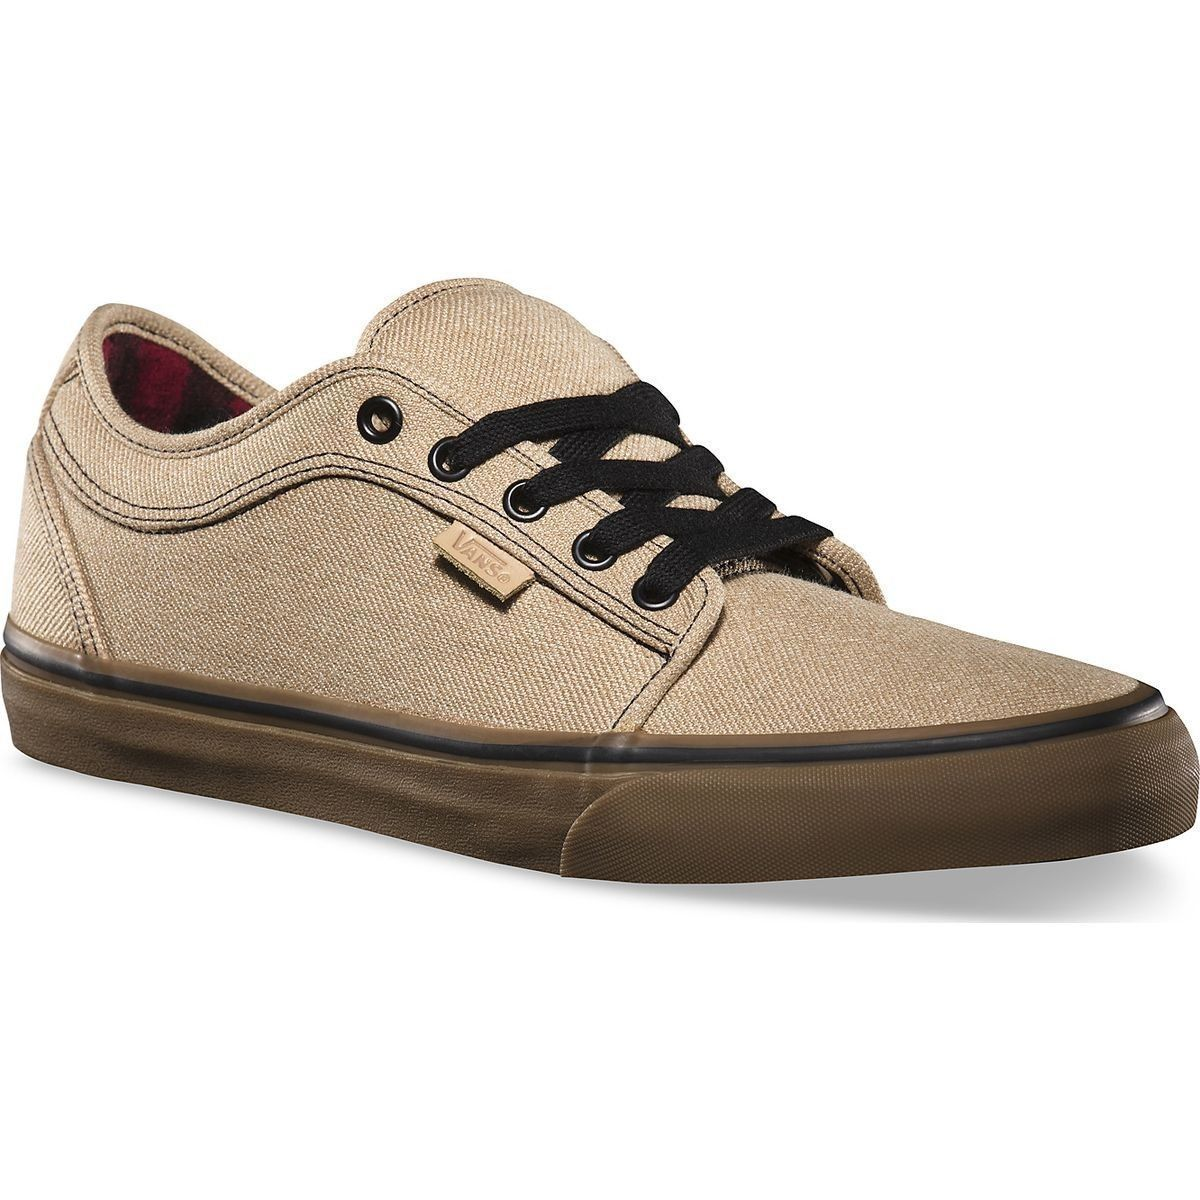 VANS Chukka Low Tan/Gum Classic Skate Shoes MEN'S 6.5 WOMEN'S 8